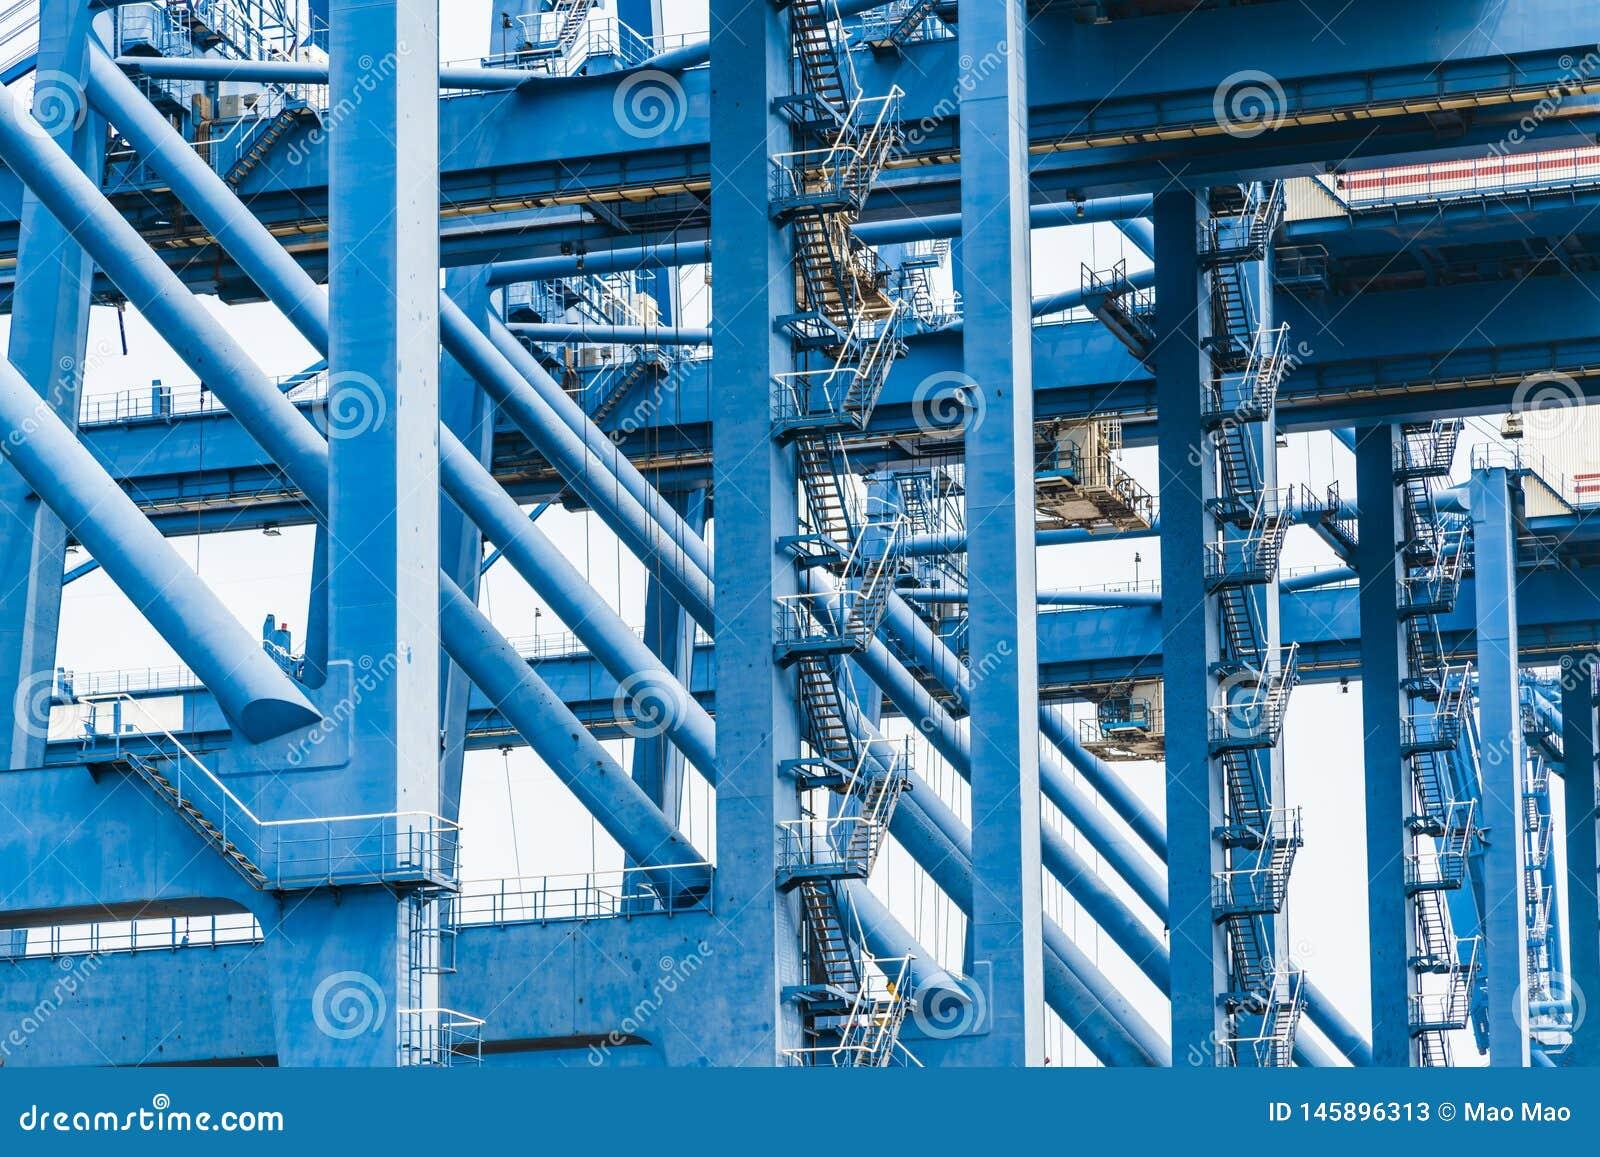 Shipping cargo to harbor by crane,tianjin,china.